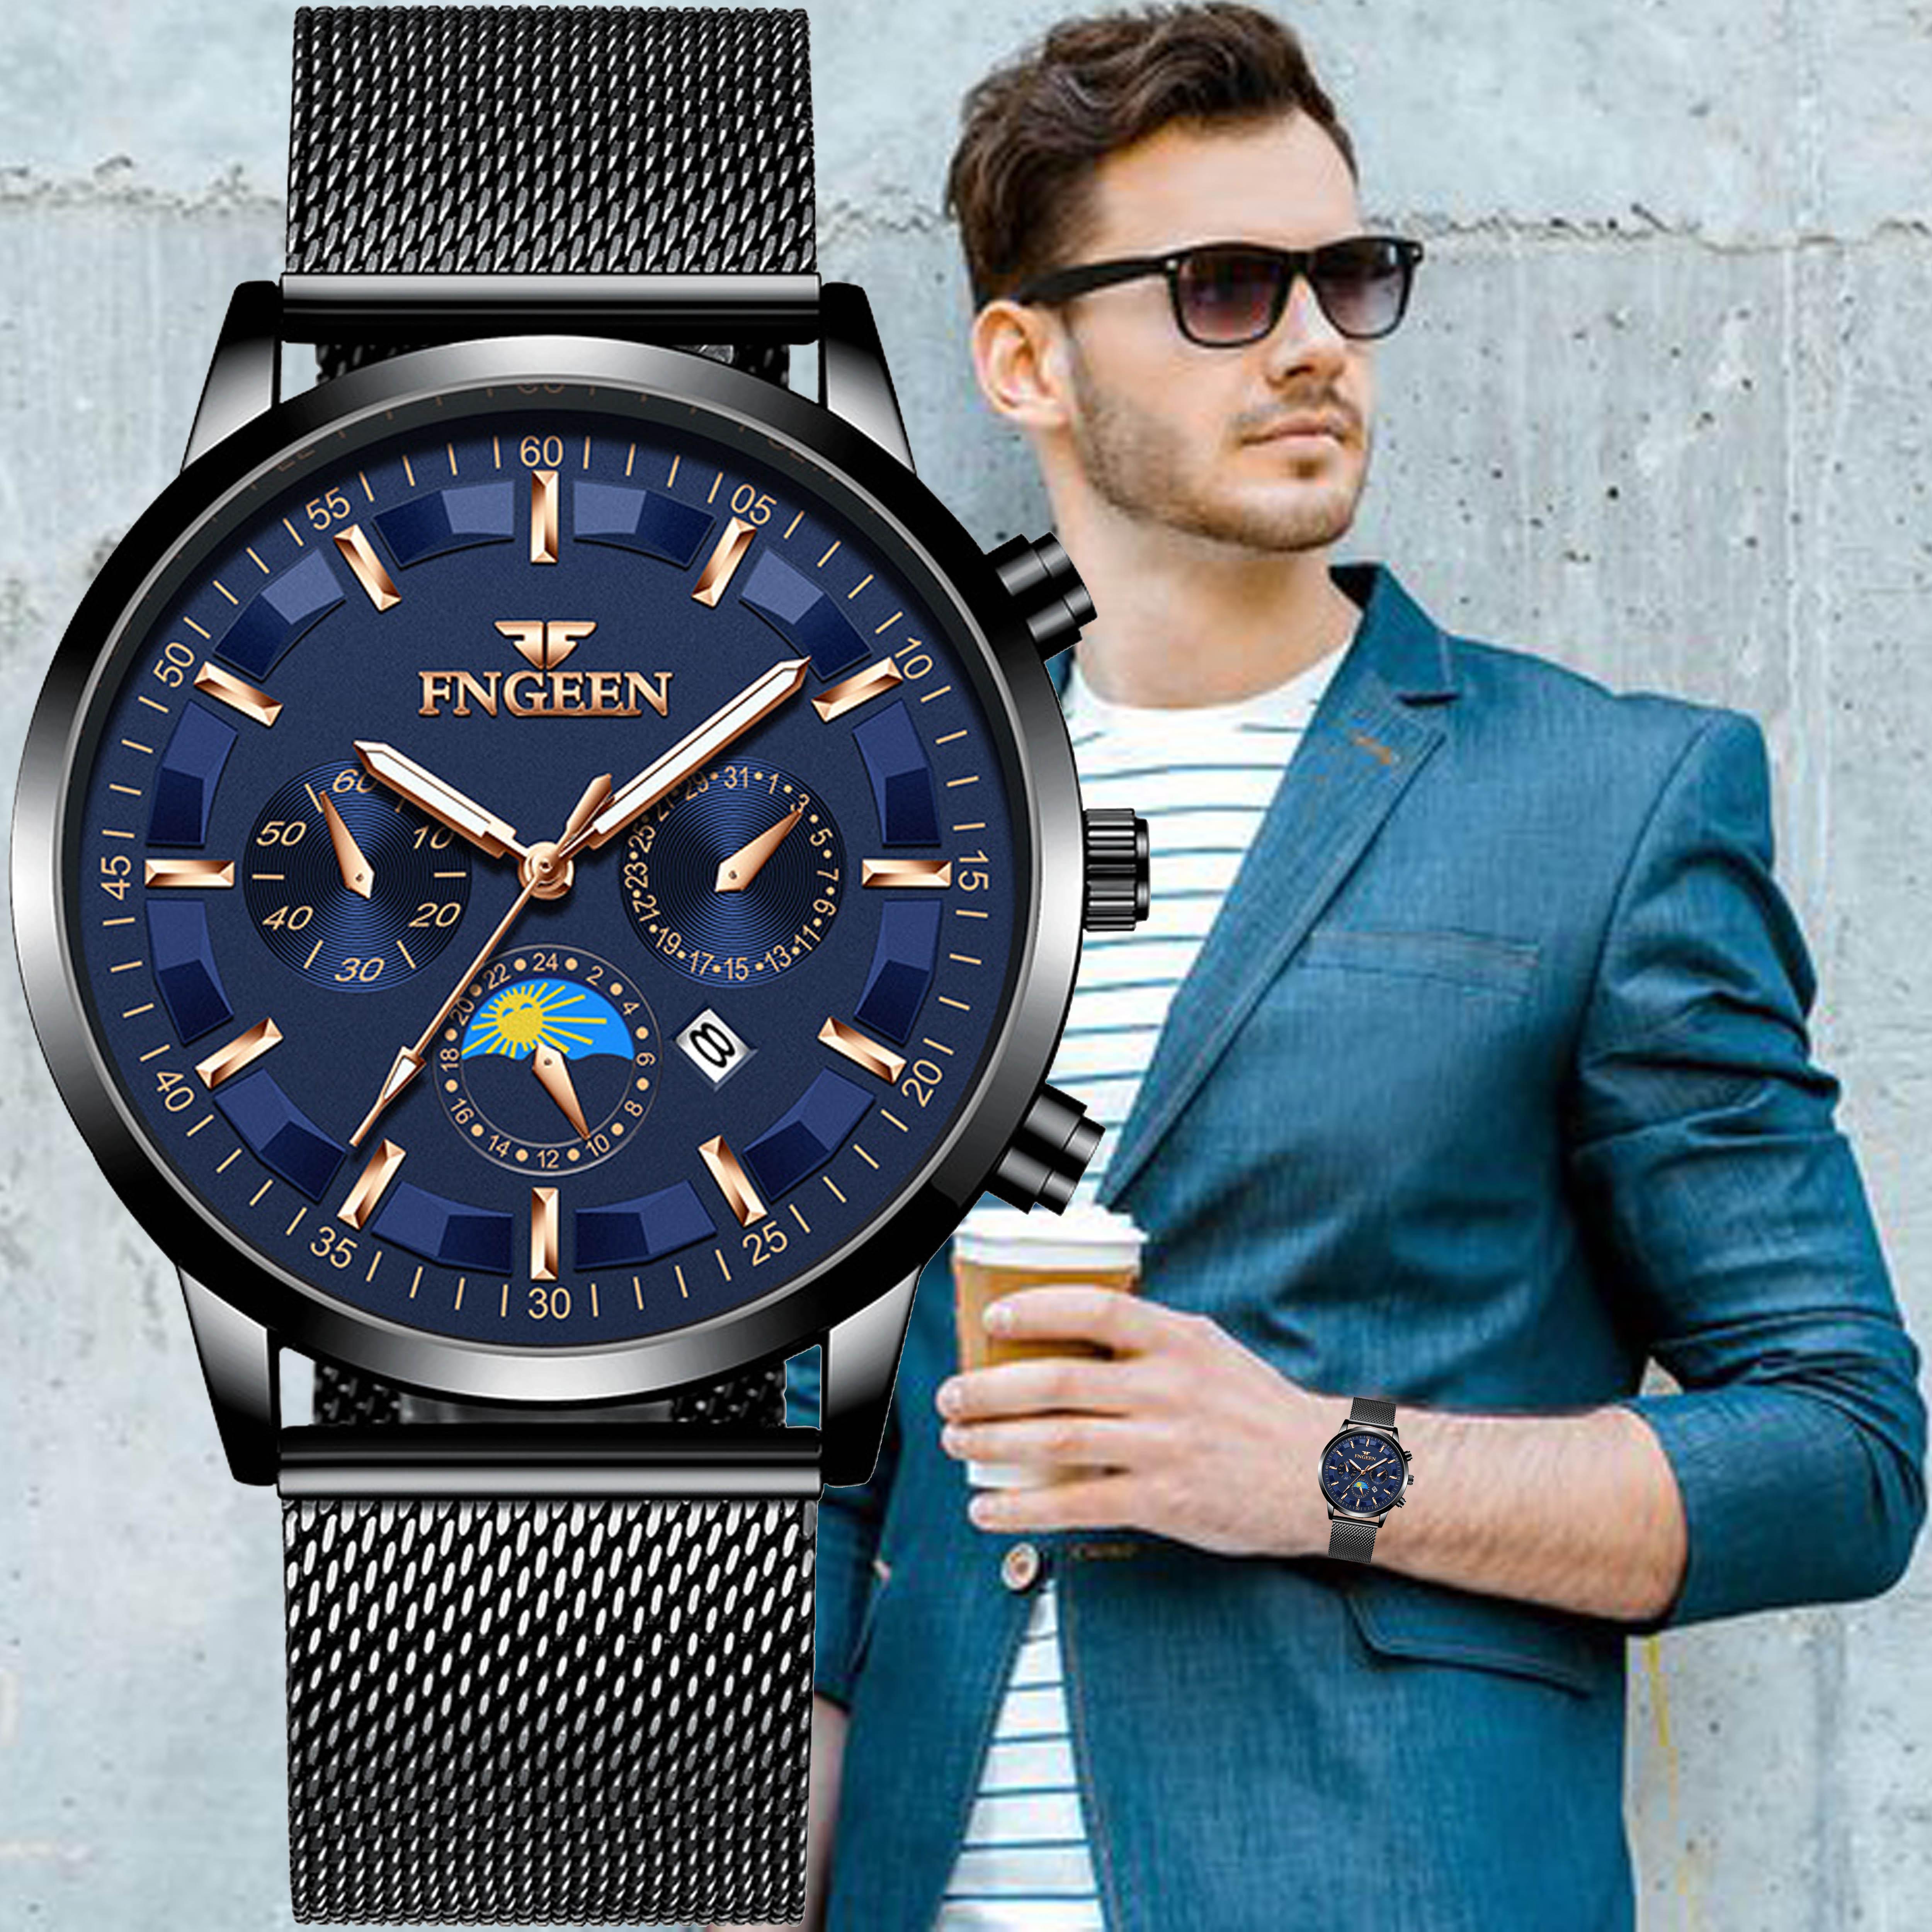 galery shop jam tangan pria  fashion jam tangan tali leather kaca kristal free box jam tangan anti air jam tangan quarts import ori fn01